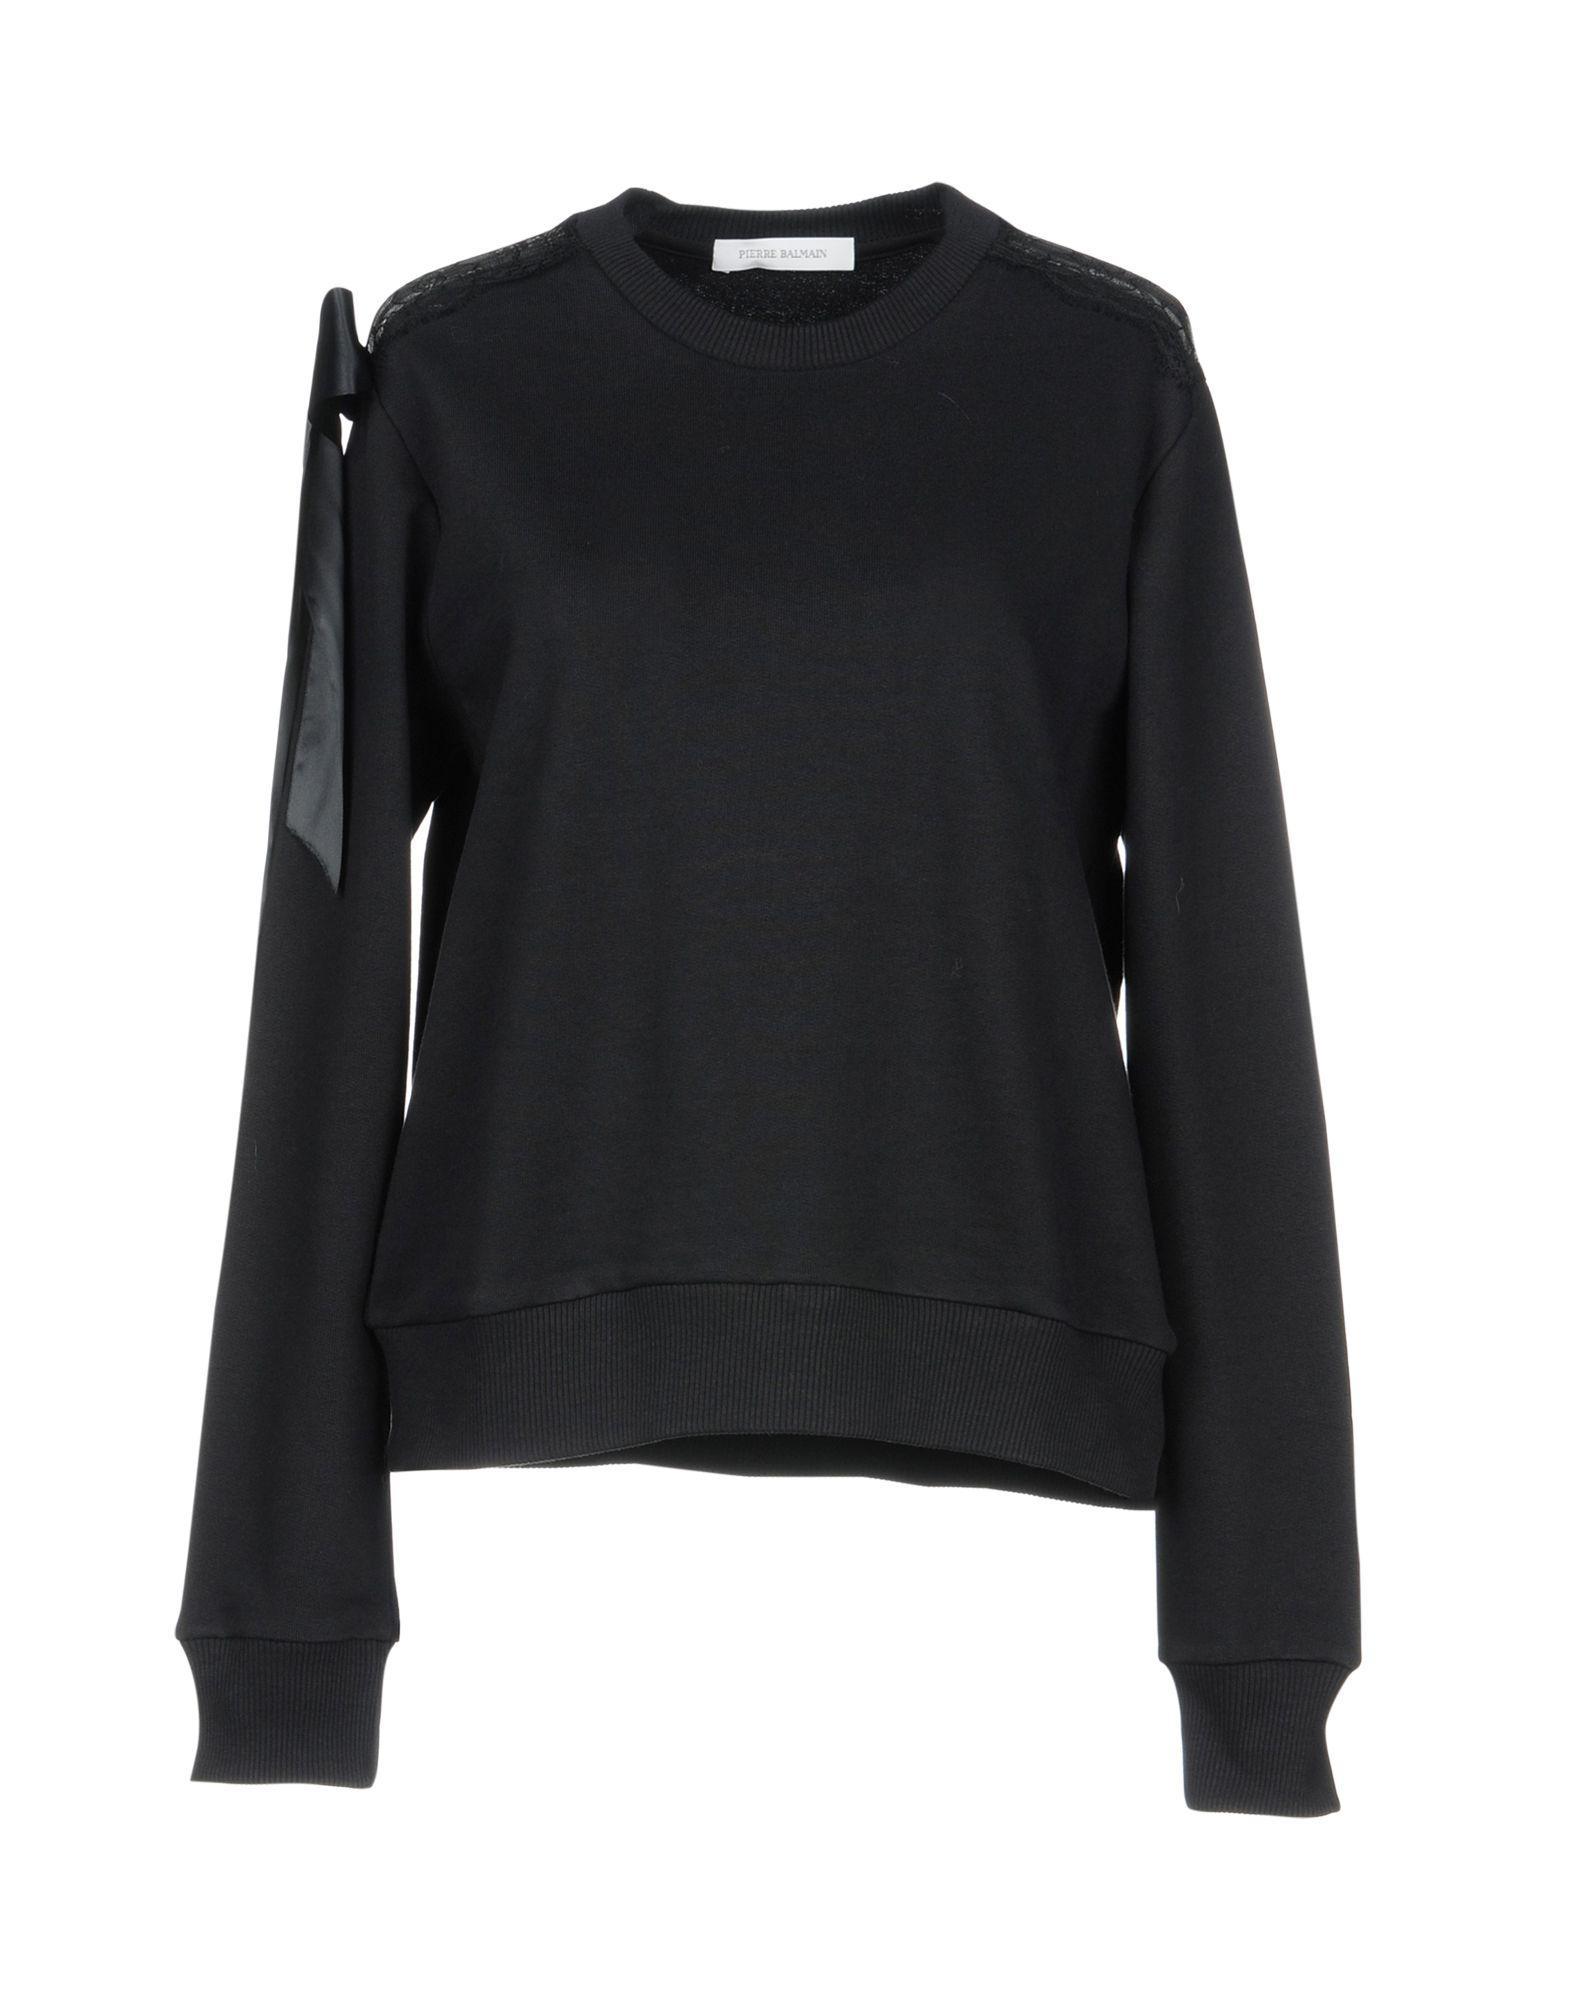 Pierre Balmain Sweatshirts In Black